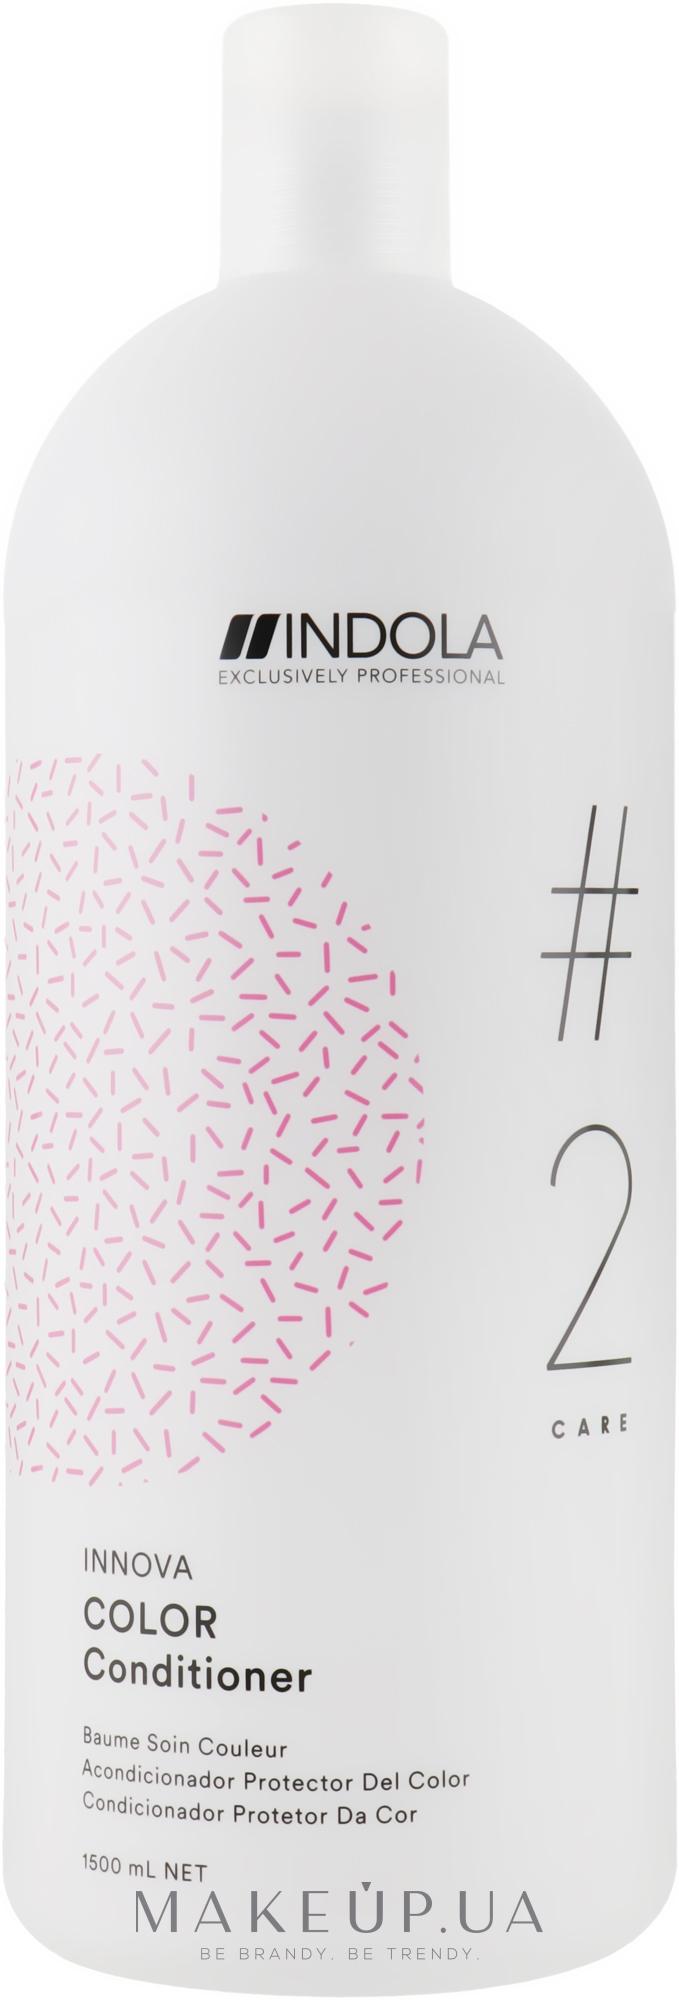 Кондиціонер для фарбованого волосся - Indola Innova Color Conditioner — фото 1500ml